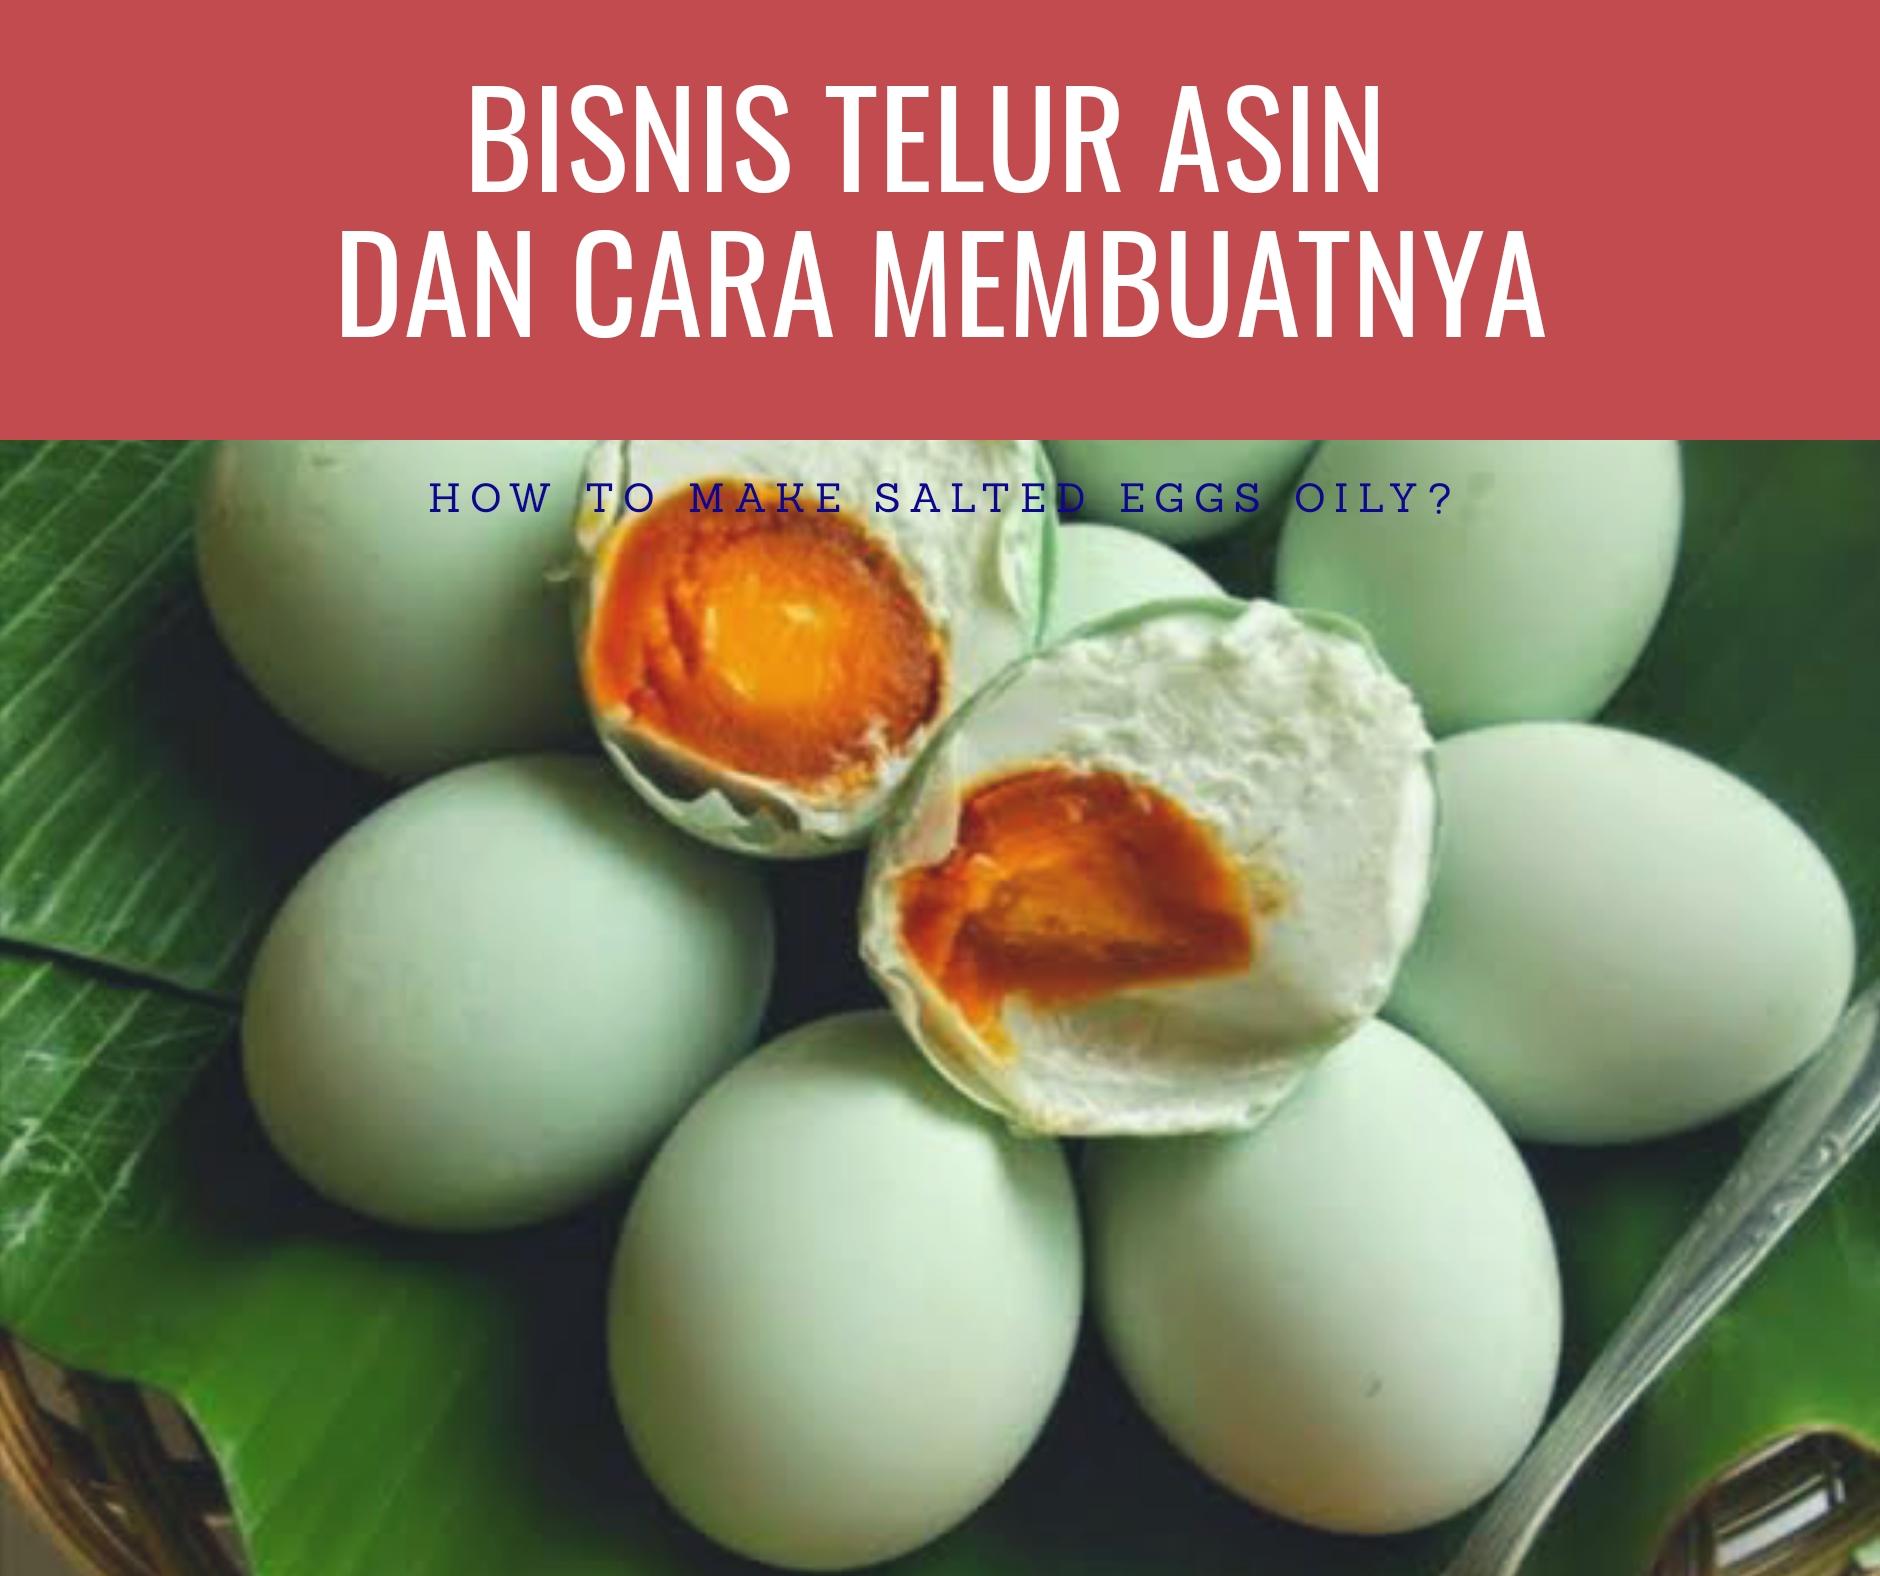 Cara Membuat Telur Asin Mudah Enak dan Anti Gagal